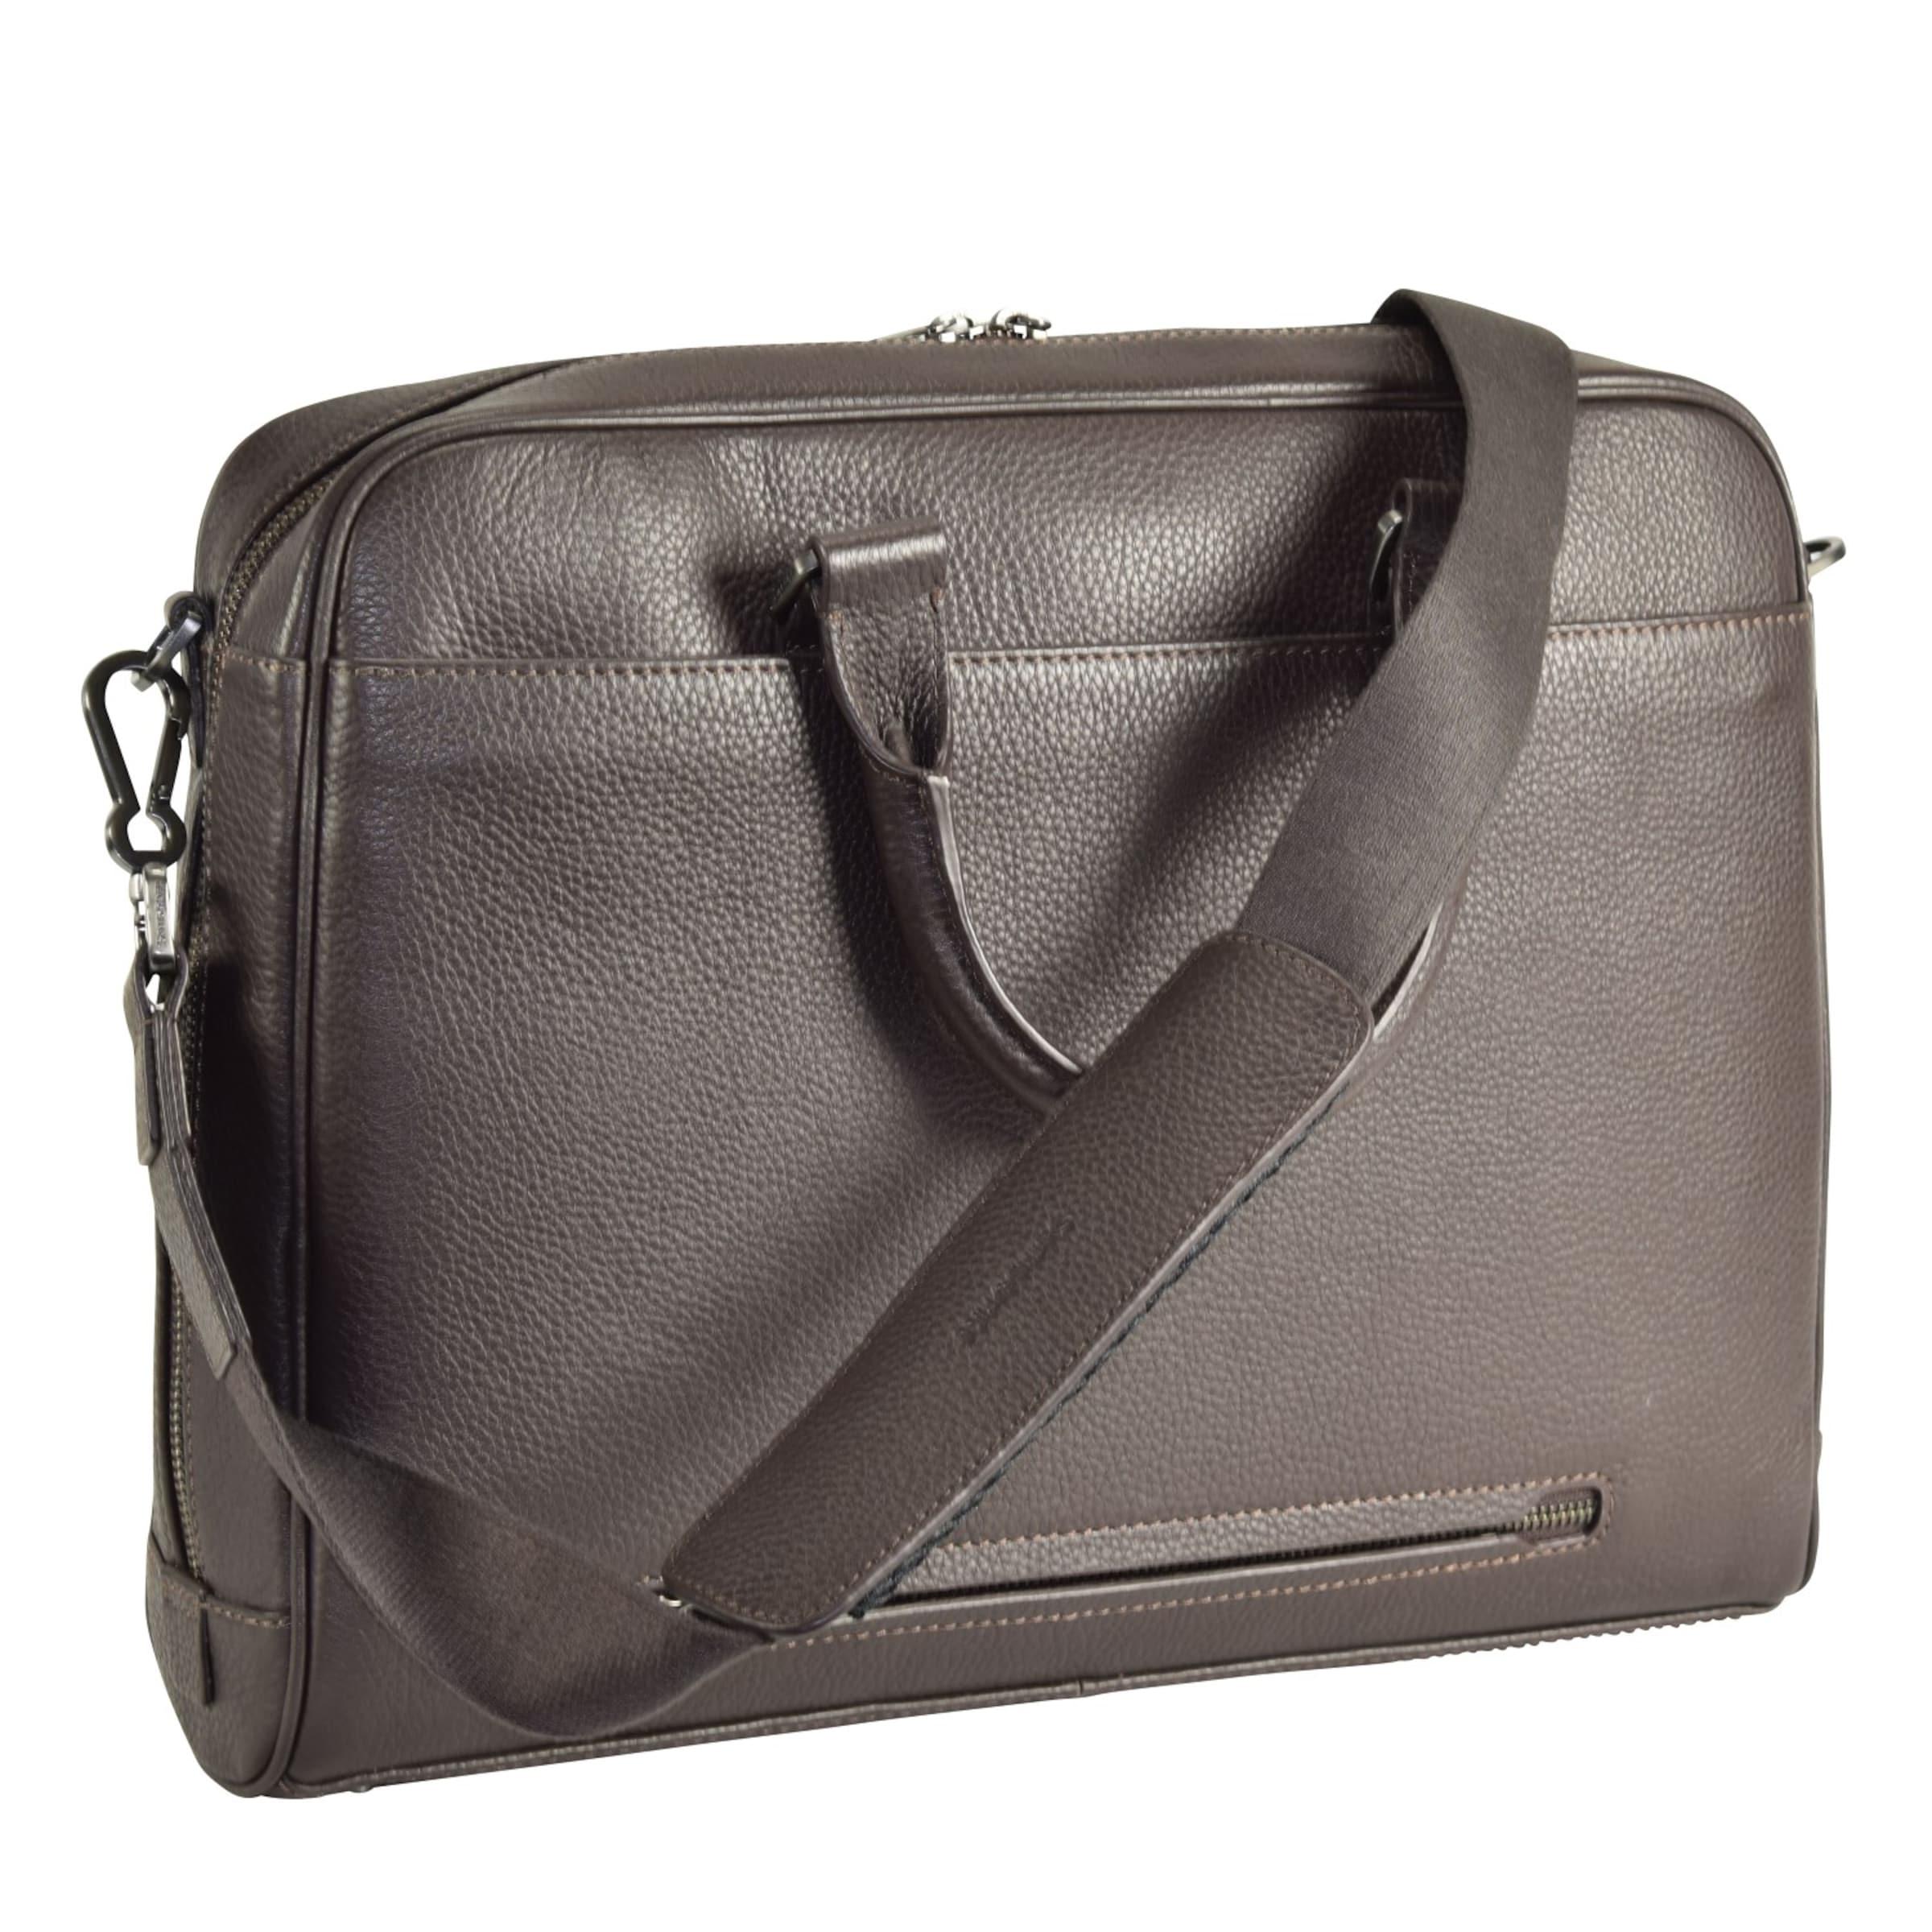 SAMSONITE Equinox Aktentasche Leder 39 cm Laptopfach Drop-Shipping Billig Verkauf Footlocker 5Vic7ST